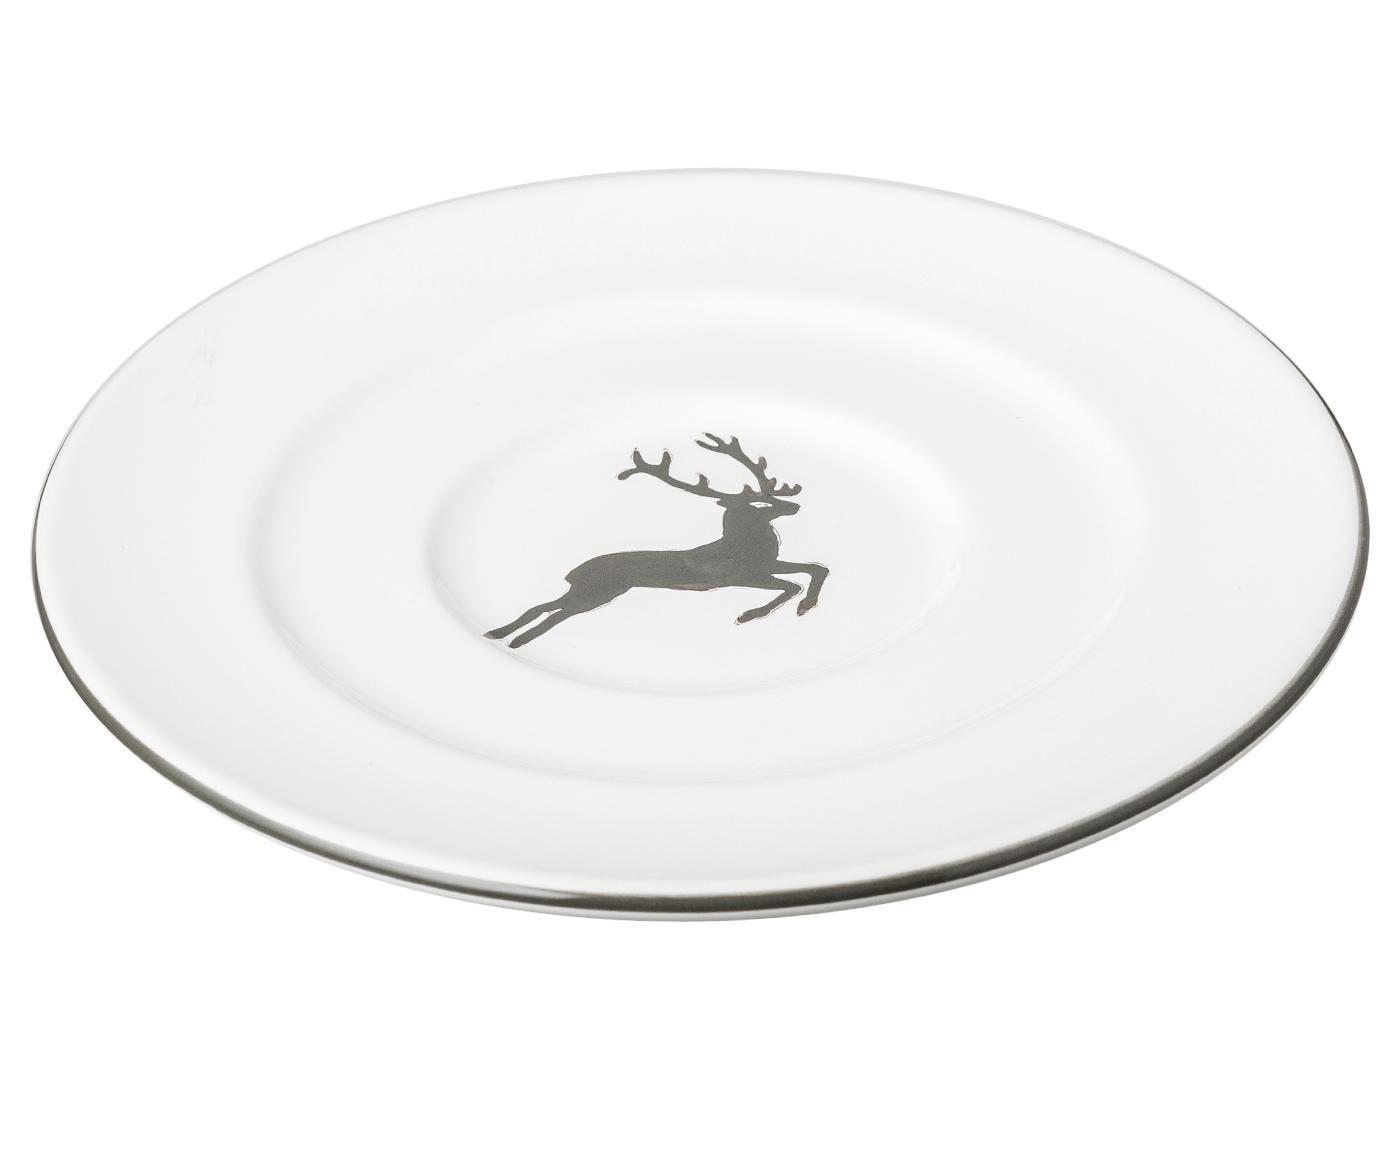 Spodek pod filiżankę Gourmet Grauer Hirsch, Ceramika, Szary, biały, Ø 16 cm